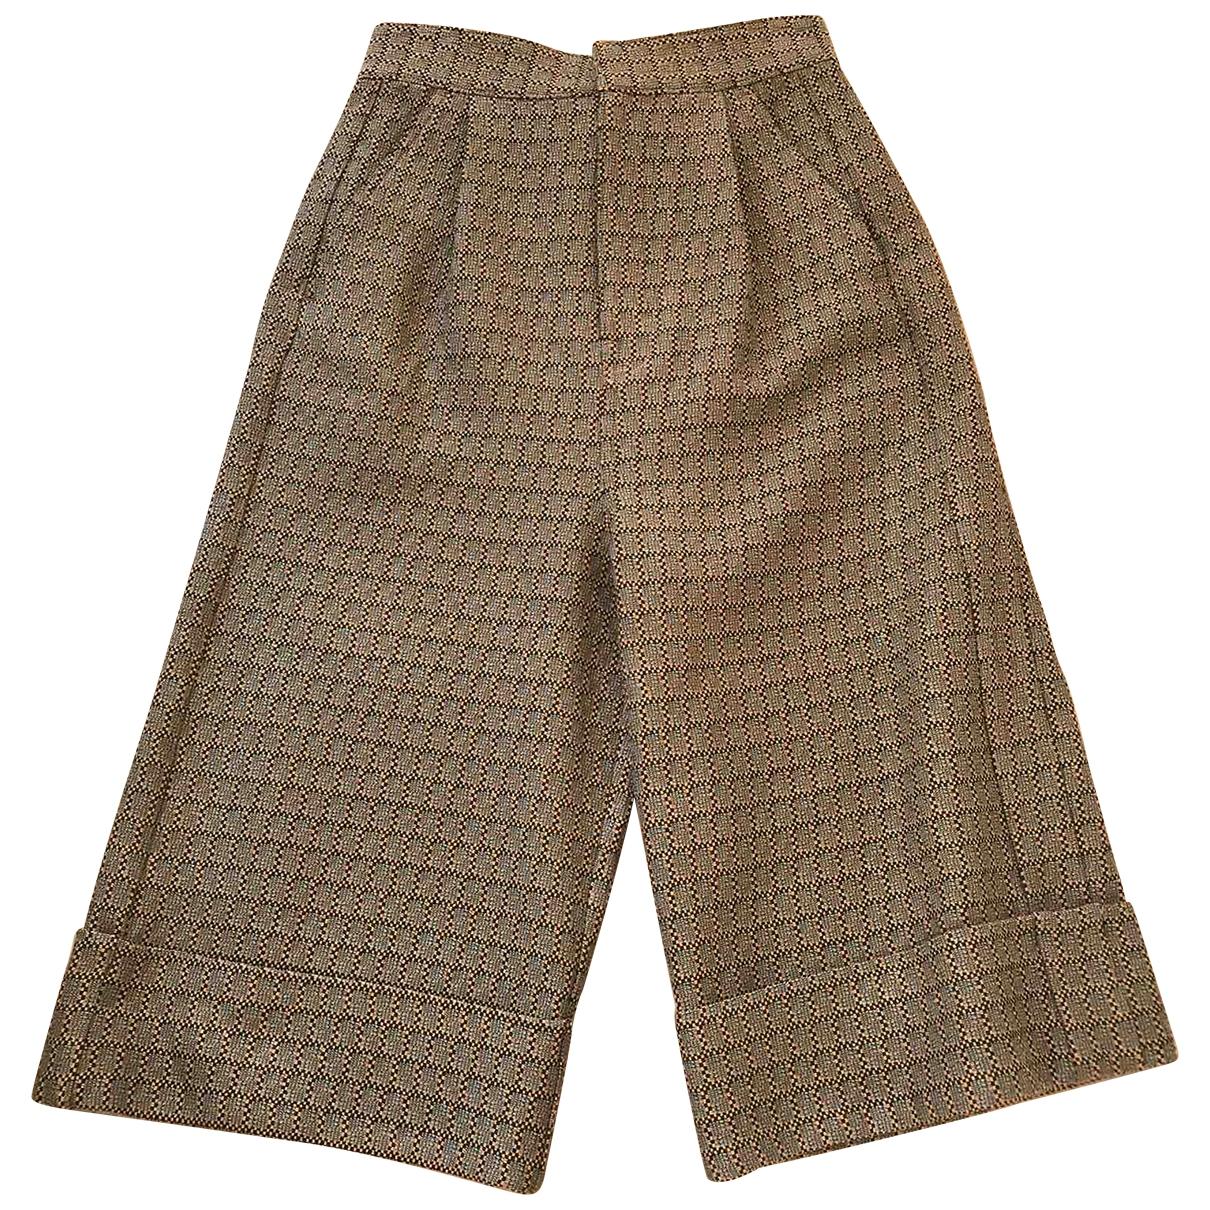 Maison Martin Margiela \N Brown Trousers for Women 38 IT